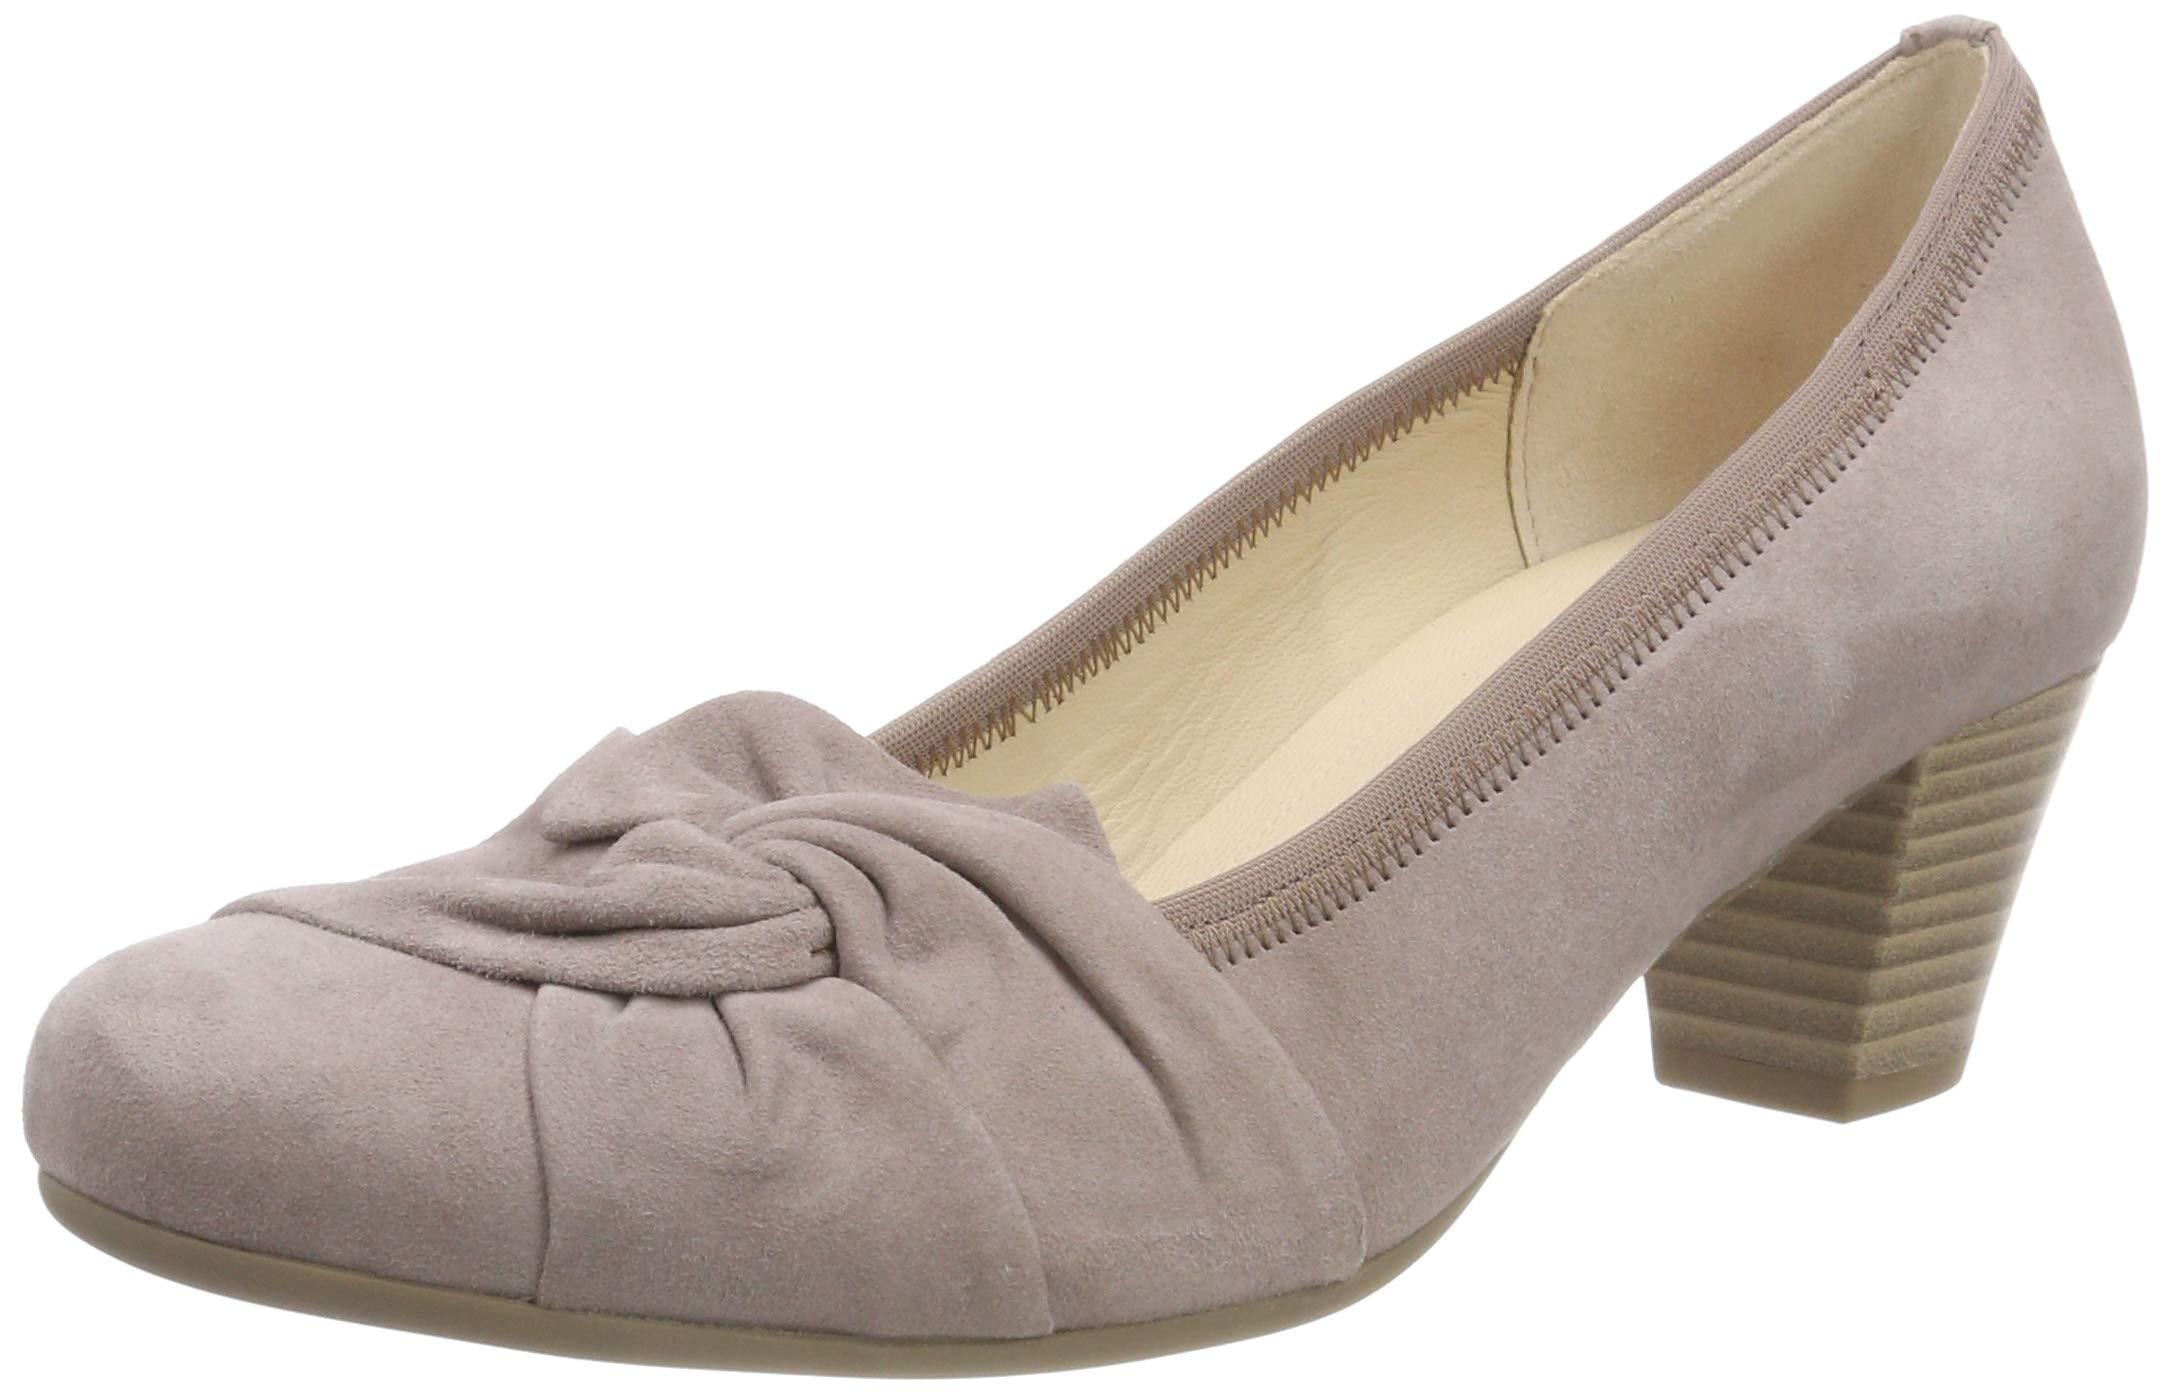 FemmeBeigenude BasicEscarpins Eu Gabor 1439 Shoes N80vmnwO